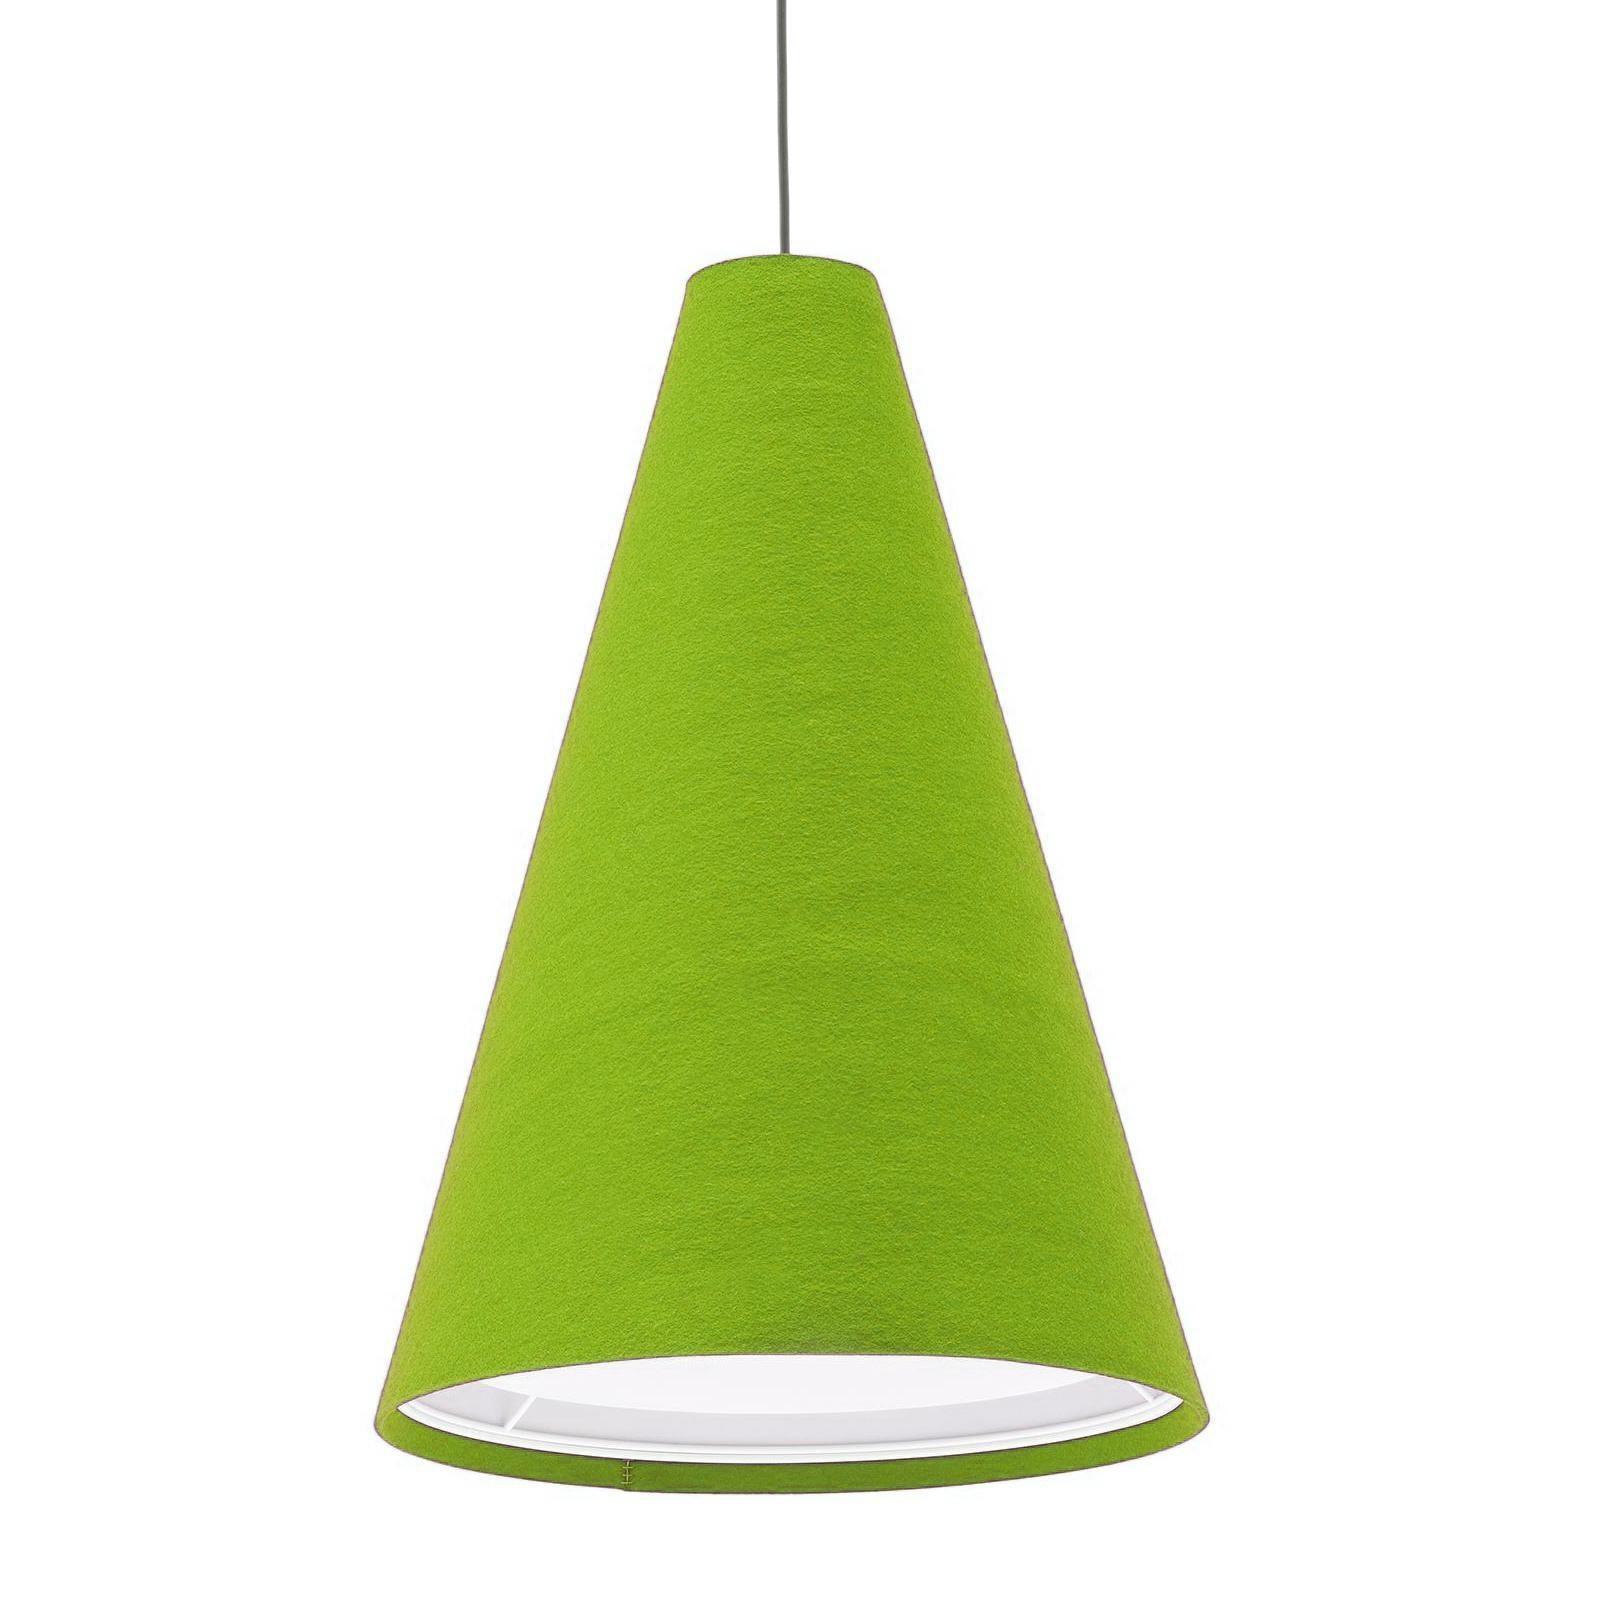 Hey-Sign - Hey-Light L - Suspension - mai vert/feutre/3mm/H 115cm / Ø 80cm